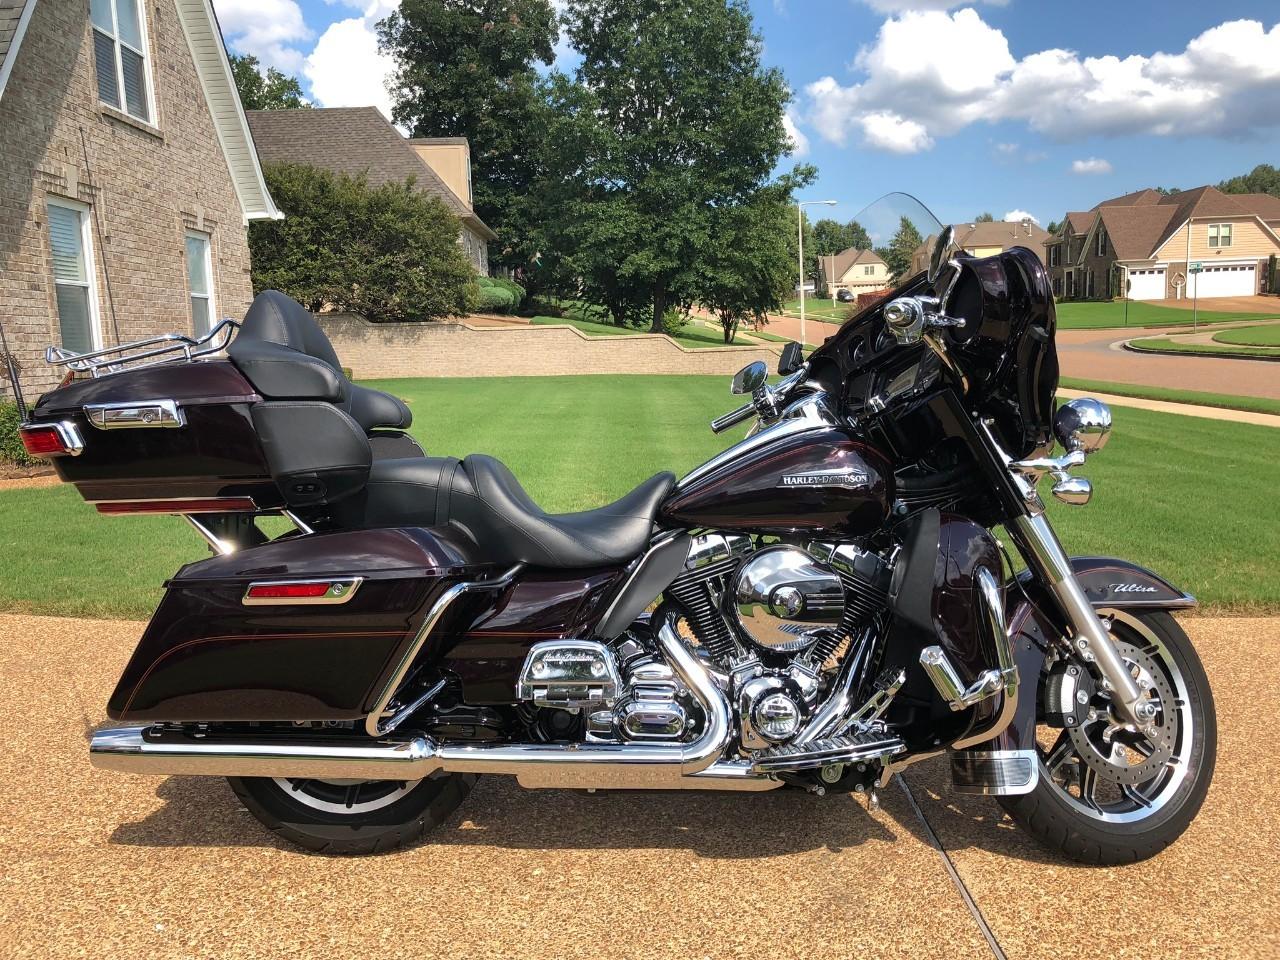 2014 Harley-Davidson ELECTRA GLIDE ULTRA CLASSIC, Memphis TN - -  Cycletrader com